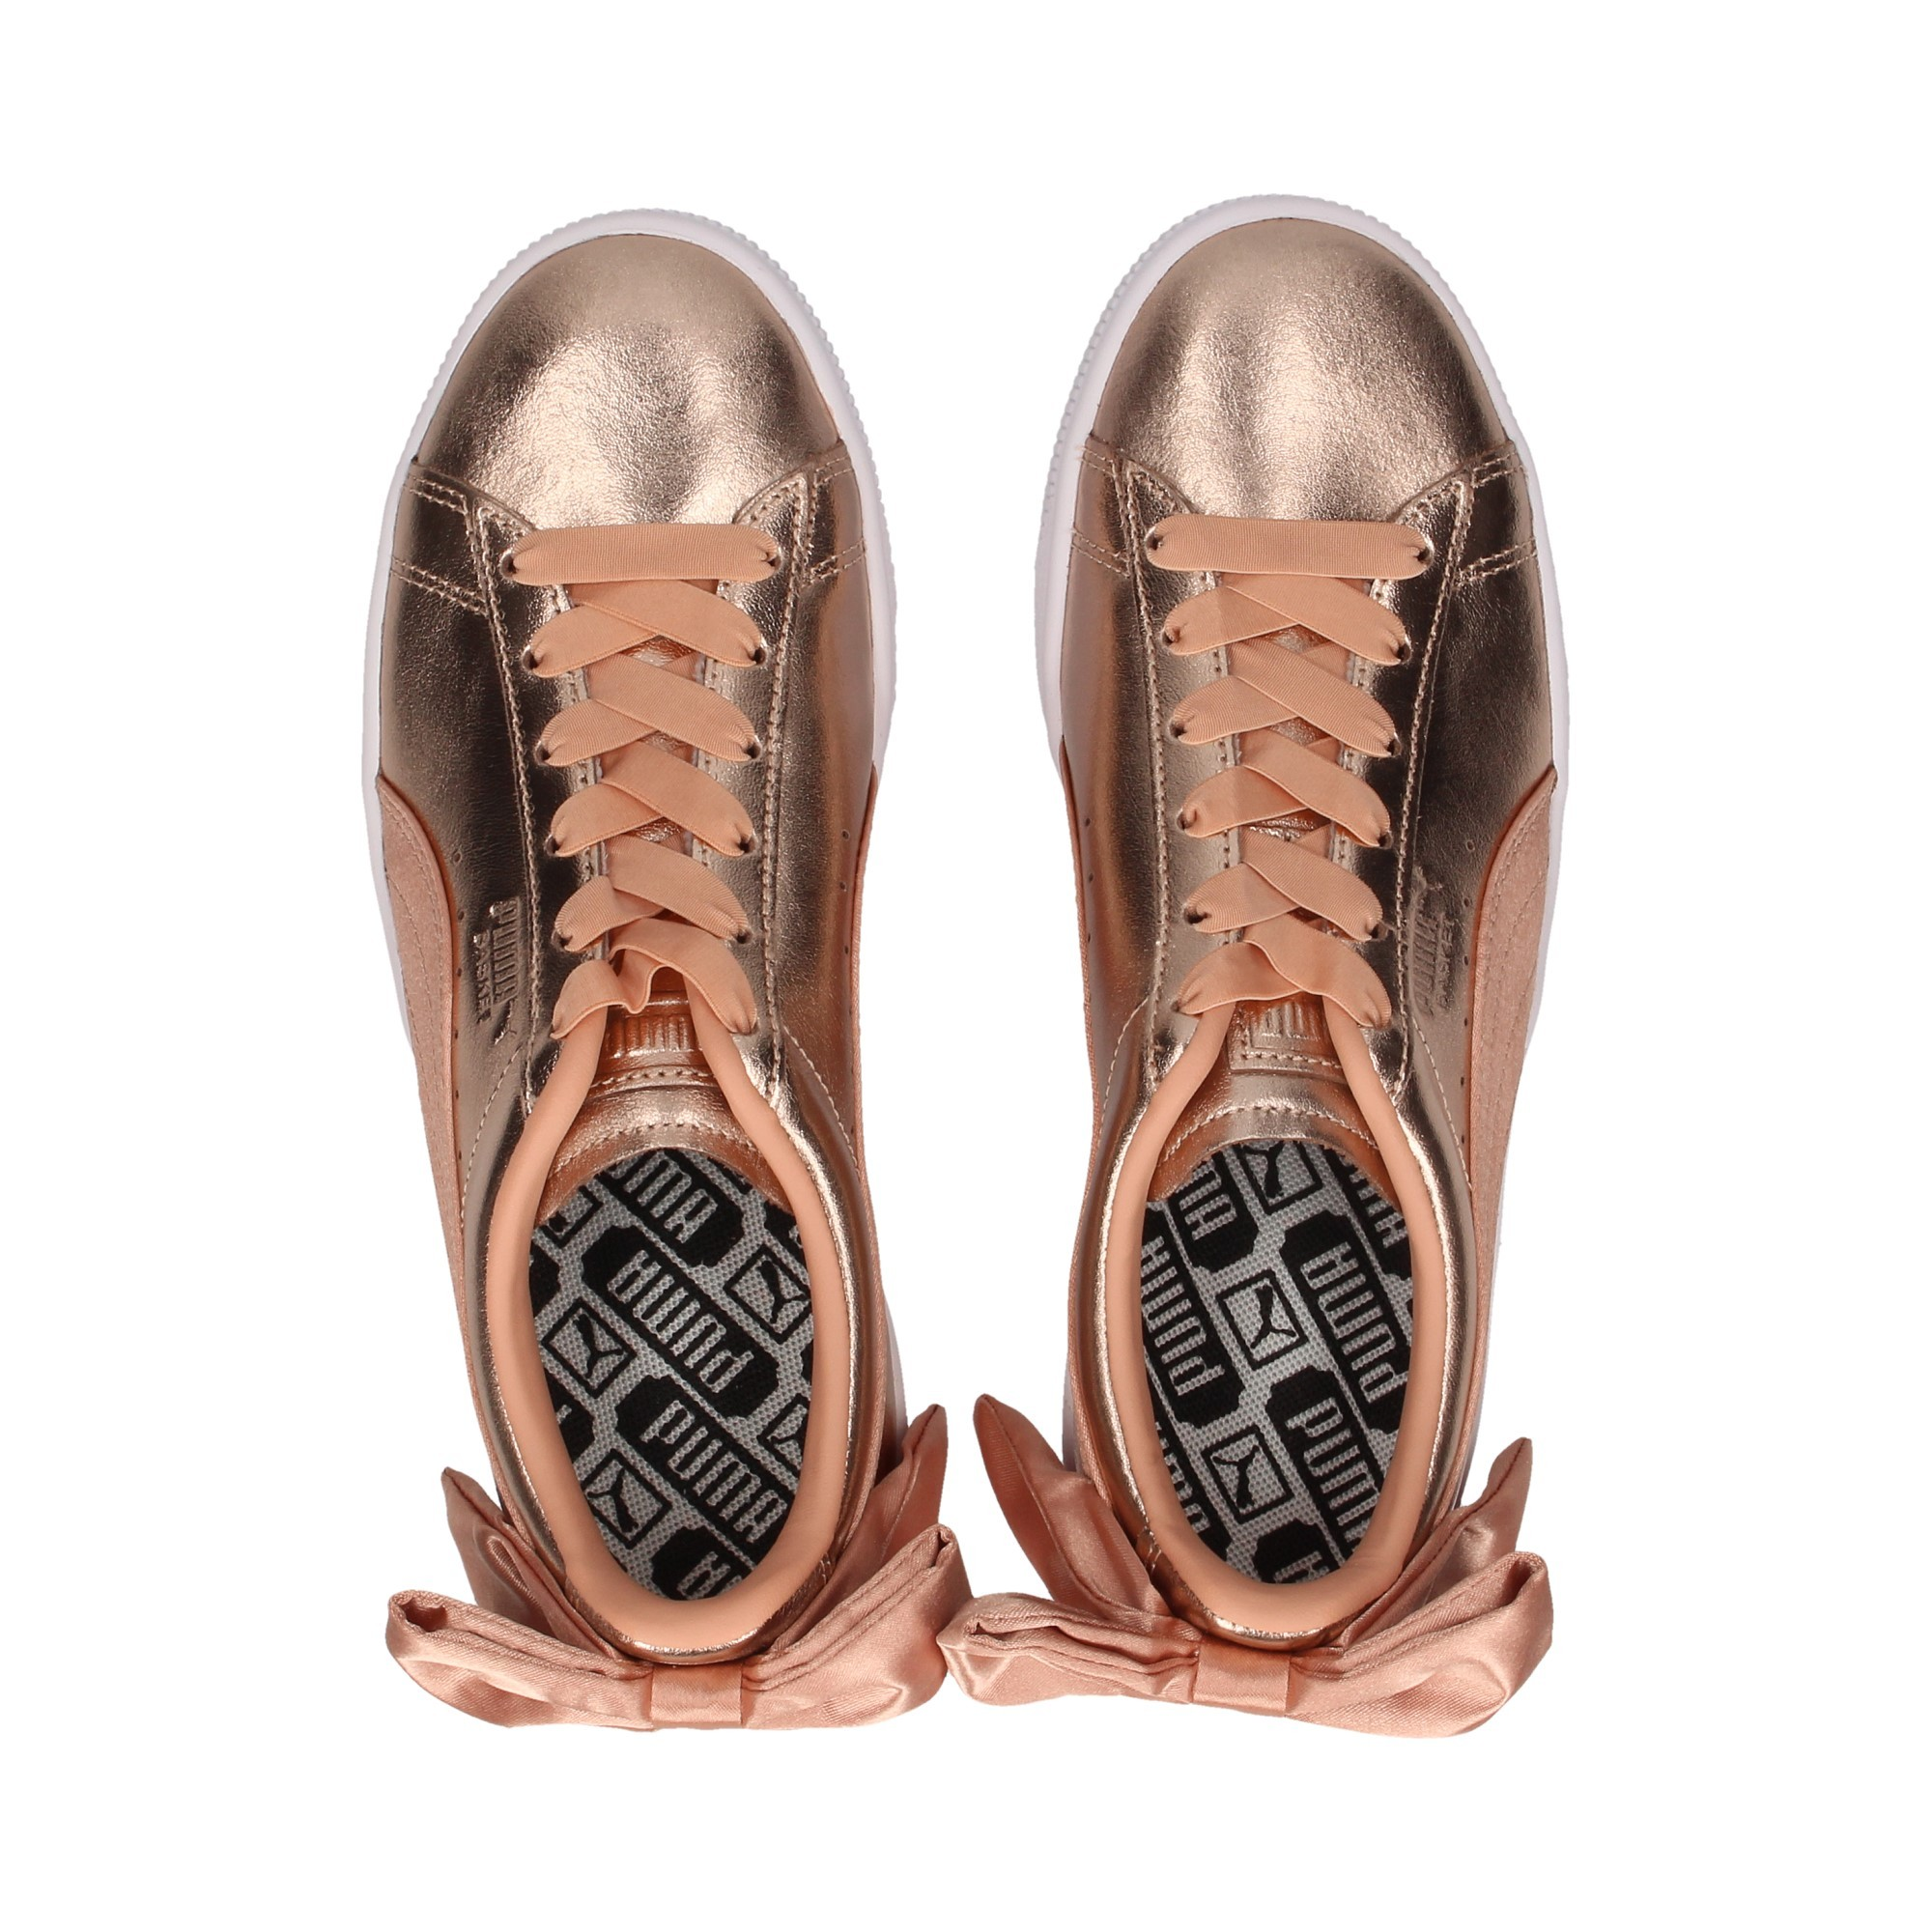 deportivo-lazo-talon-metalizado-cobre